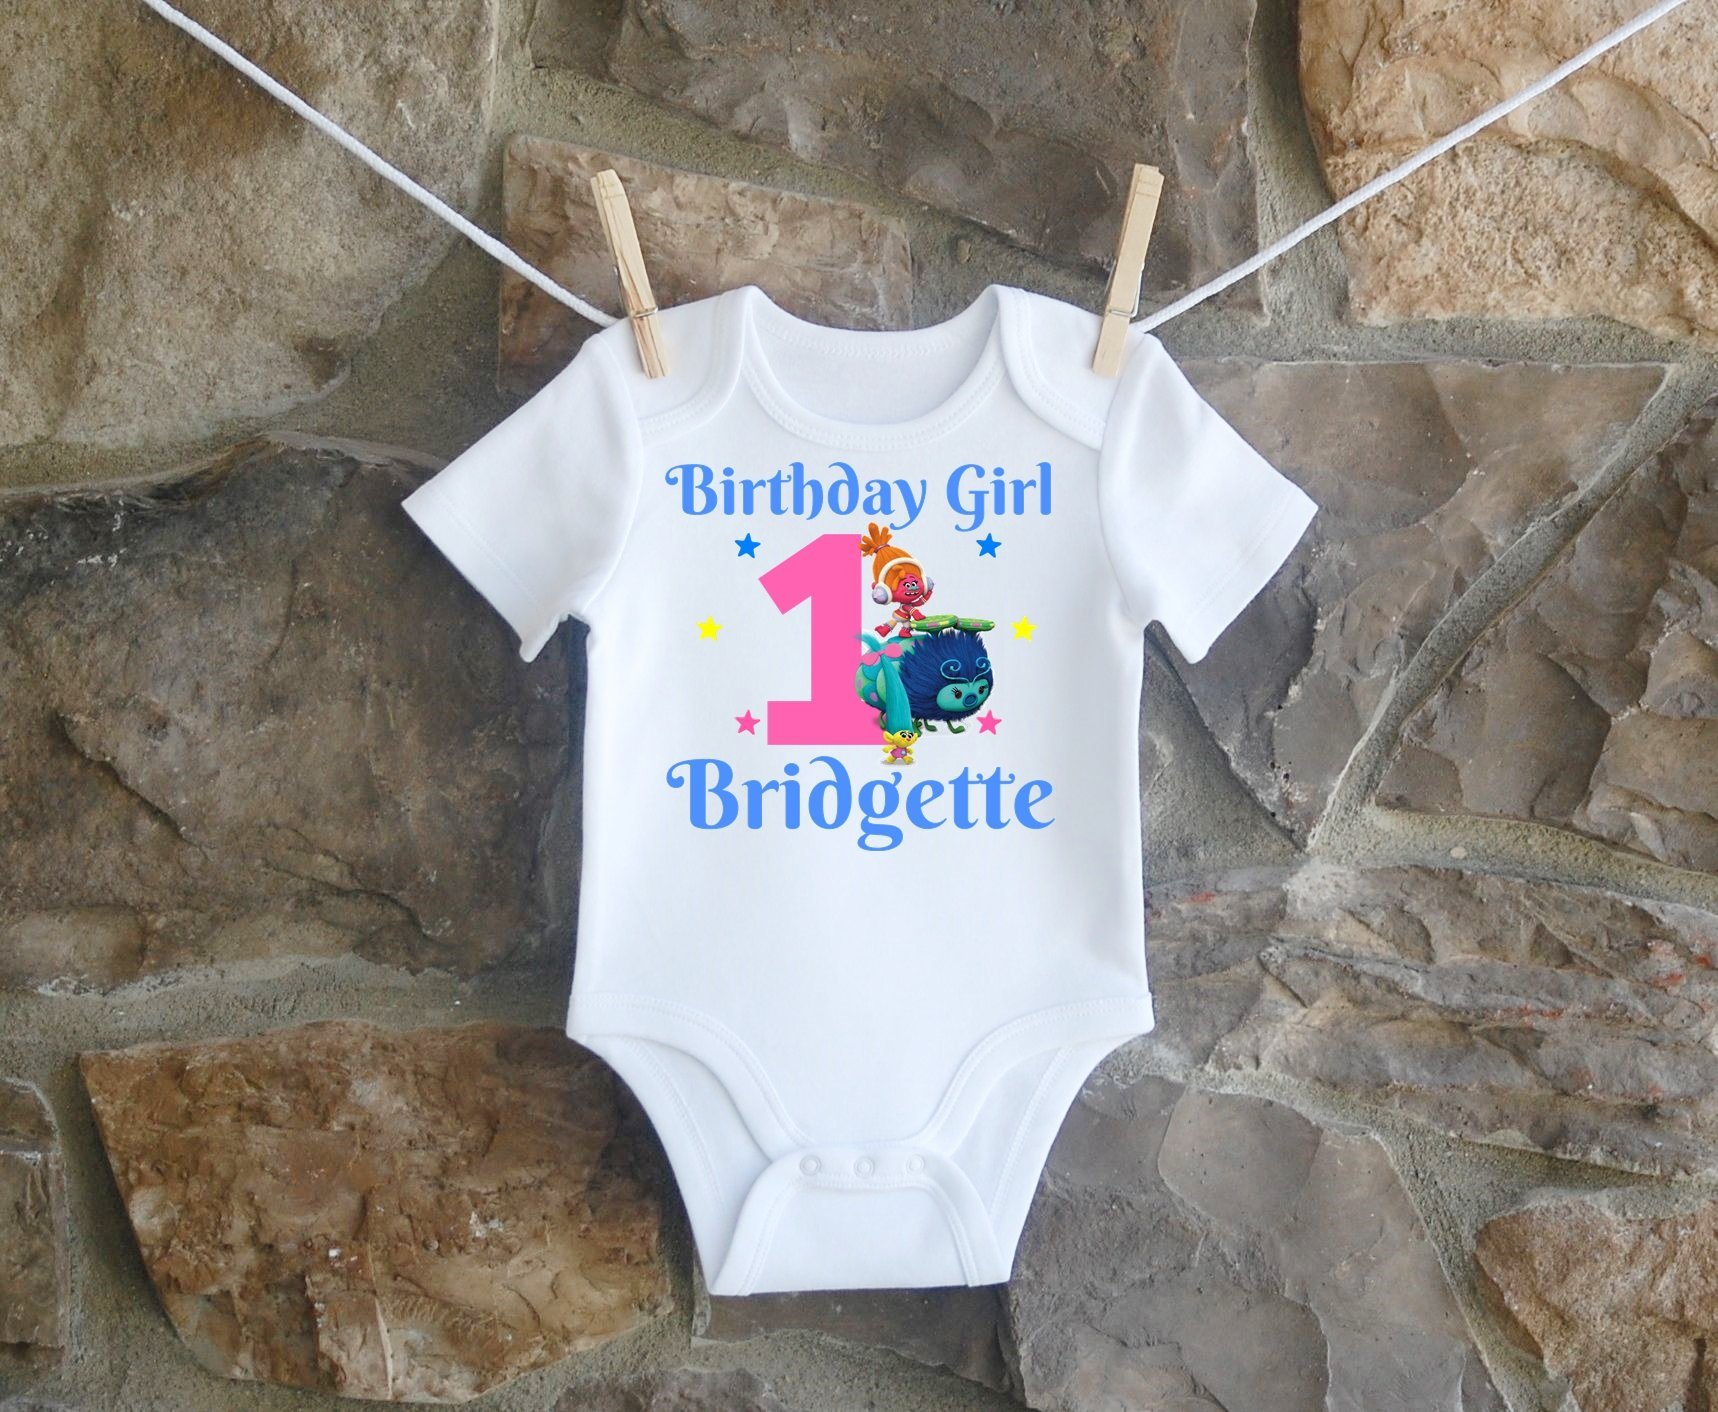 Trolls DJ Smidge Suki Birthday Shirt, Trolls DJ Smidge Suki Birthday Shirt For Girls, Personalized Girls Trolls DJ Smidge Suki Birthday Shirt, Customized Trolls DJ Smidge Suki Birthday Shirt